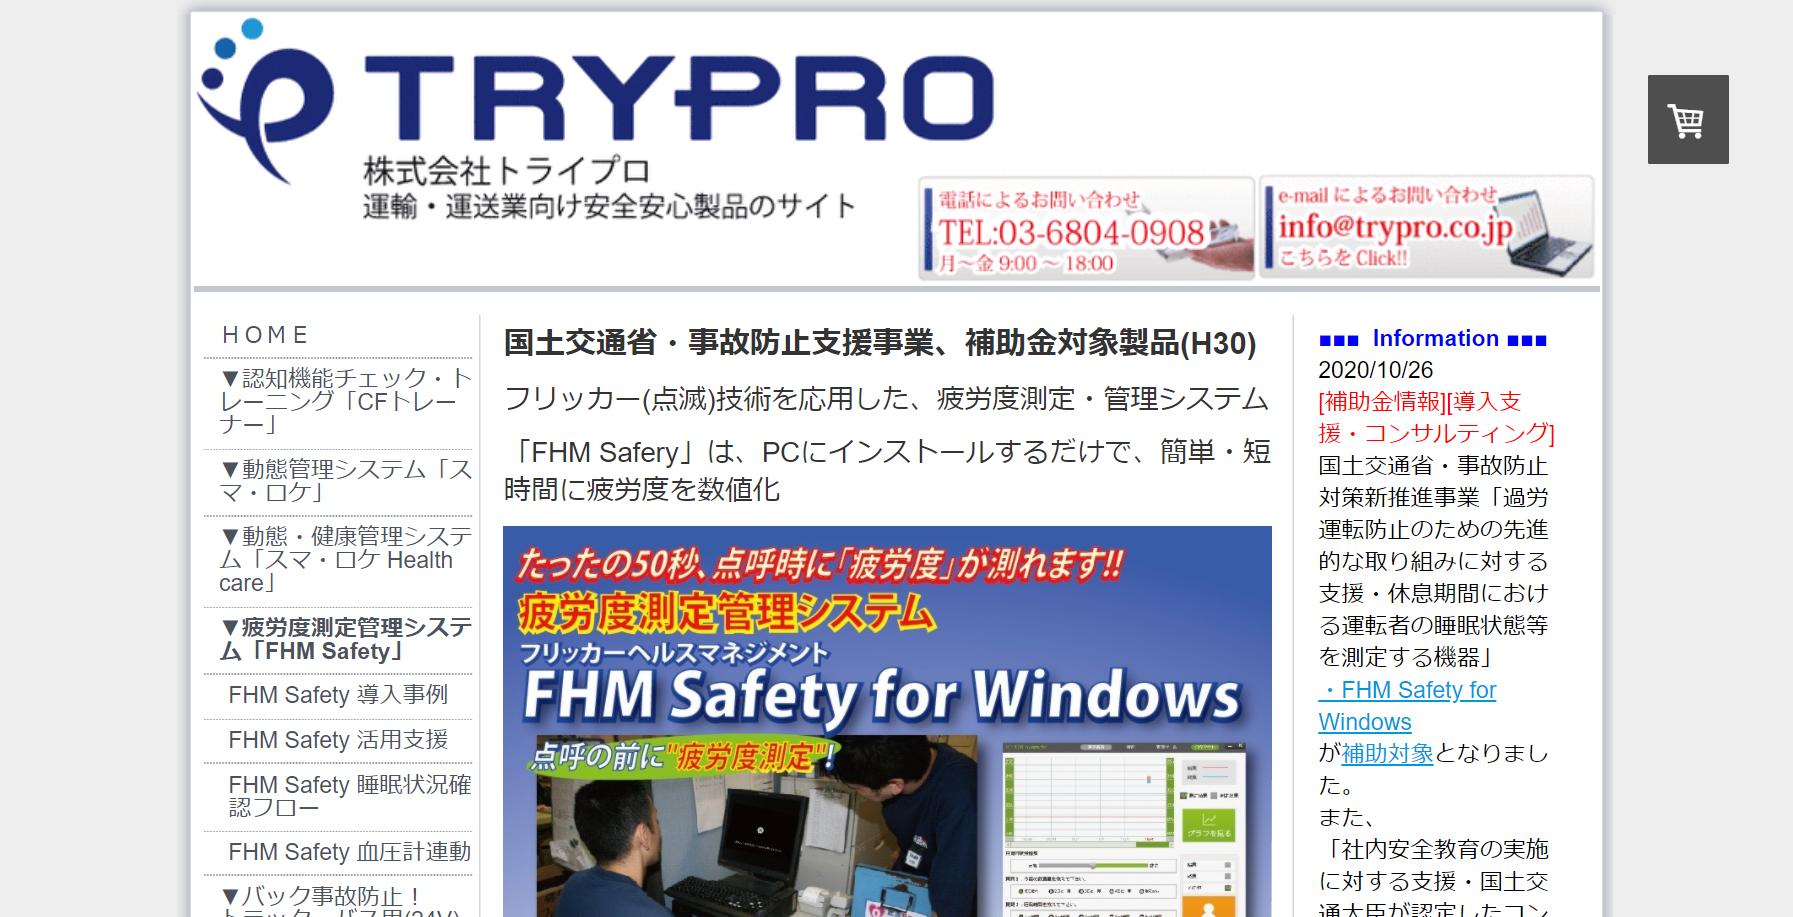 FHM Safery